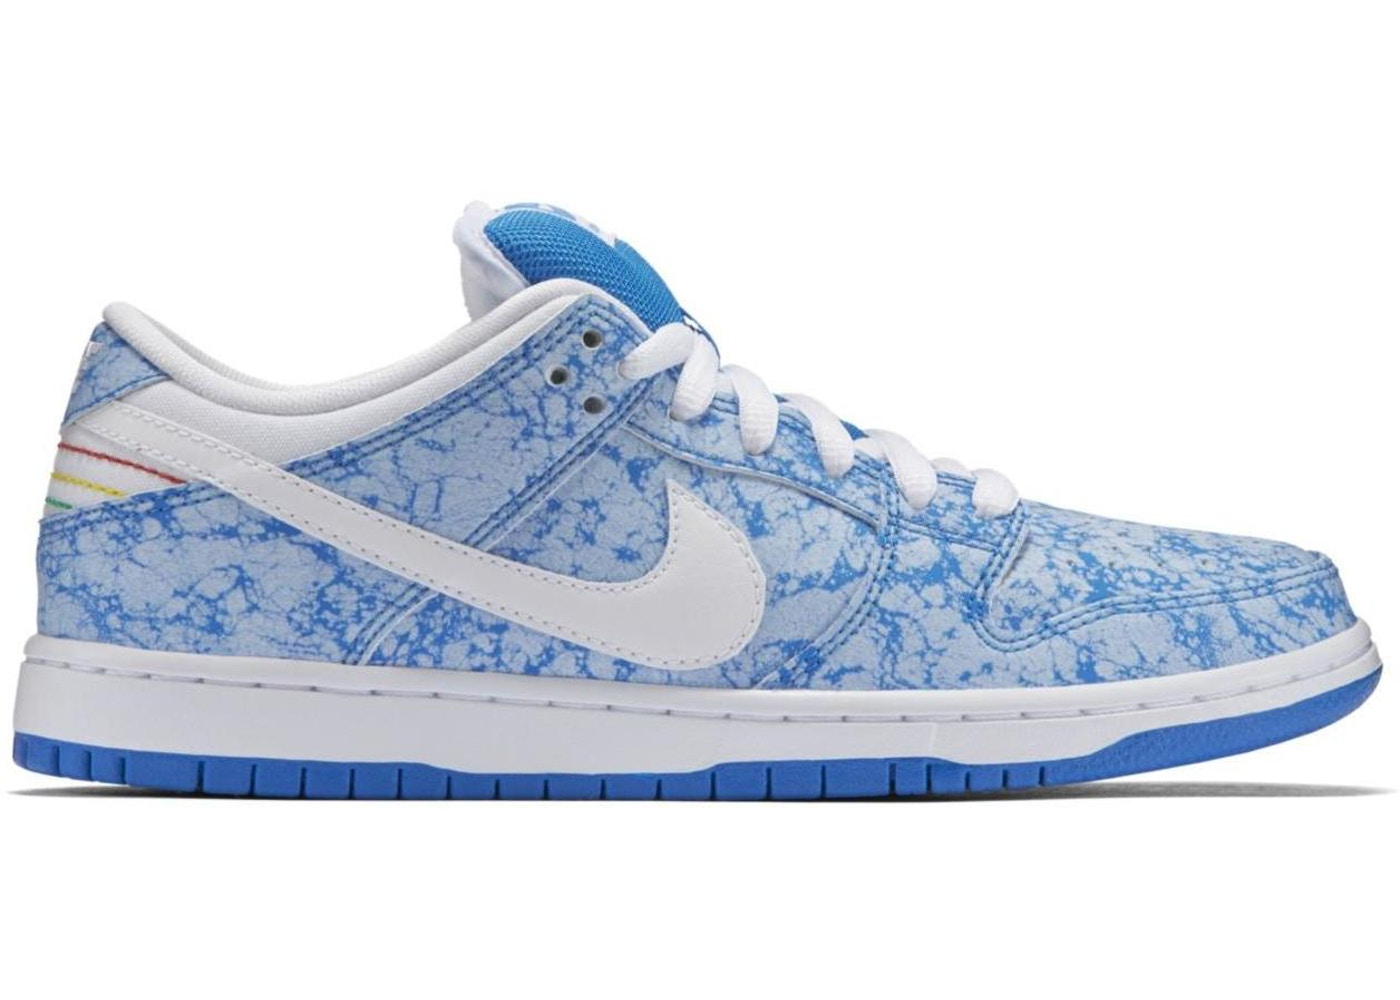 florero Confinar vulgar  Nike Dunk SB Low Blue Marble - 313170-401